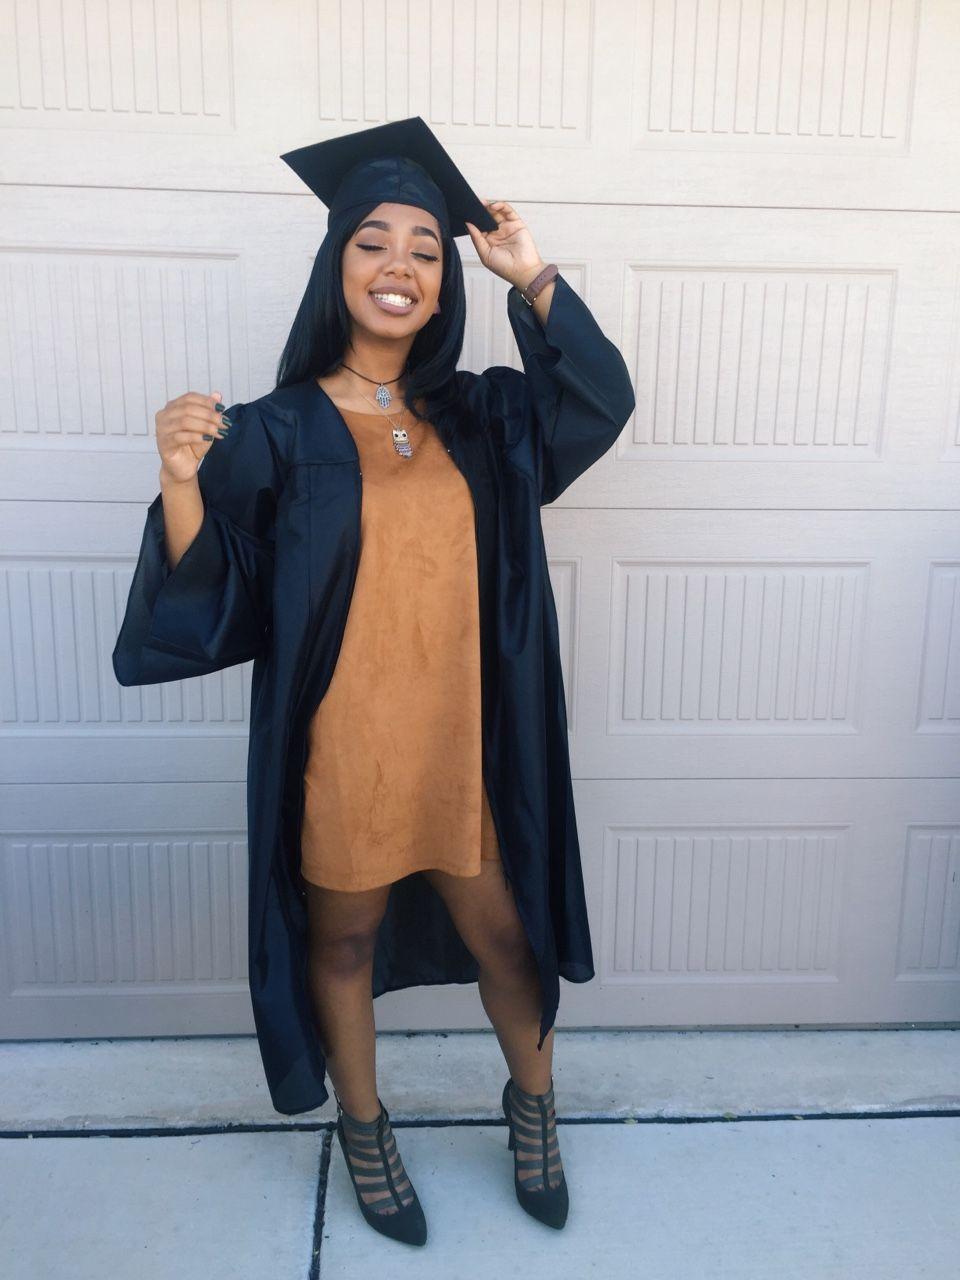 IAMHANNALASHAY — bootyneedslovin:   black excellence! I made it out...